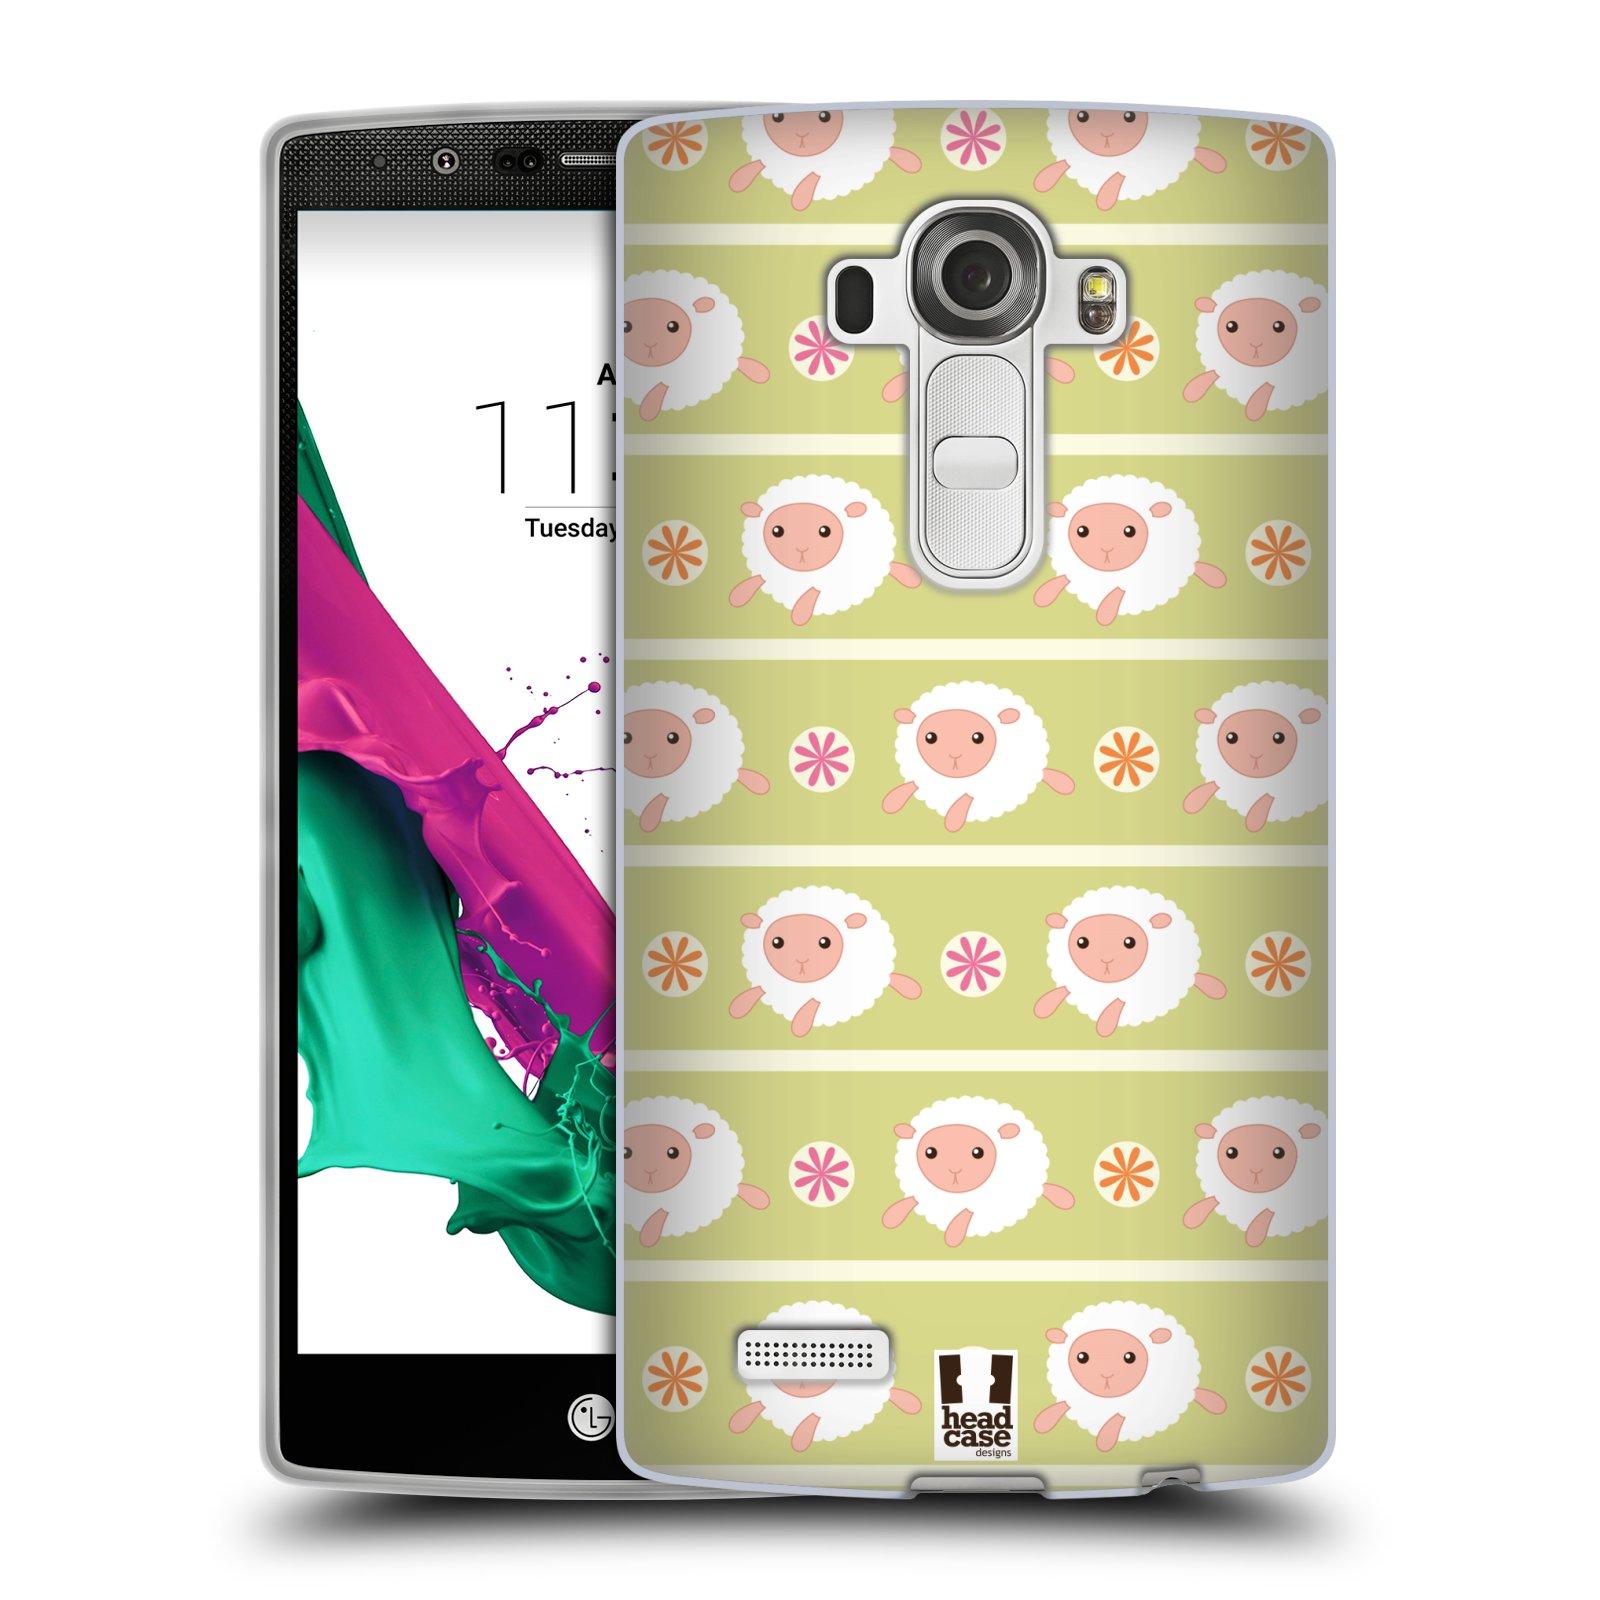 HEAD CASE silikonový obal na mobil LG G4 vzor roztomilé zvířecí vzory ovečky